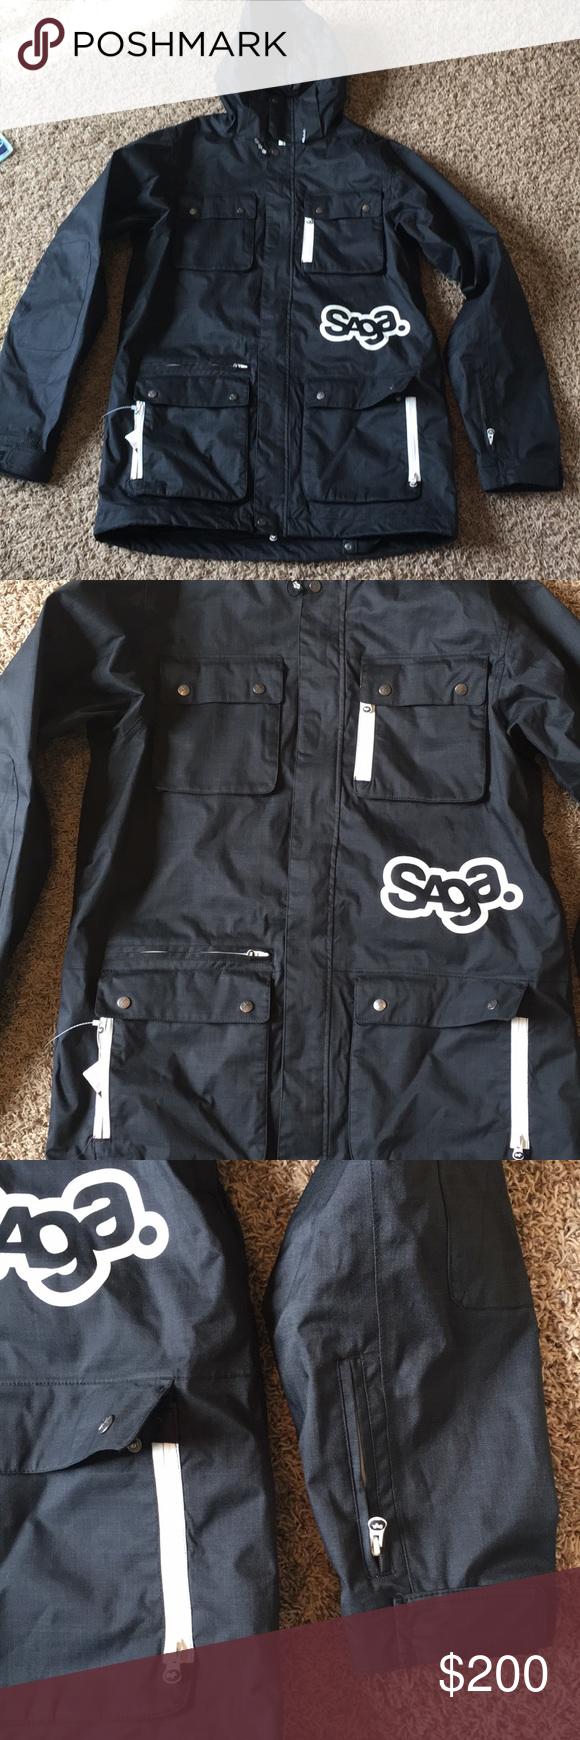 Ski Jacket Saga Anomie 2 Layer Ski Jacket Ski Jacket Jackets Clothes Design [ 1740 x 580 Pixel ]